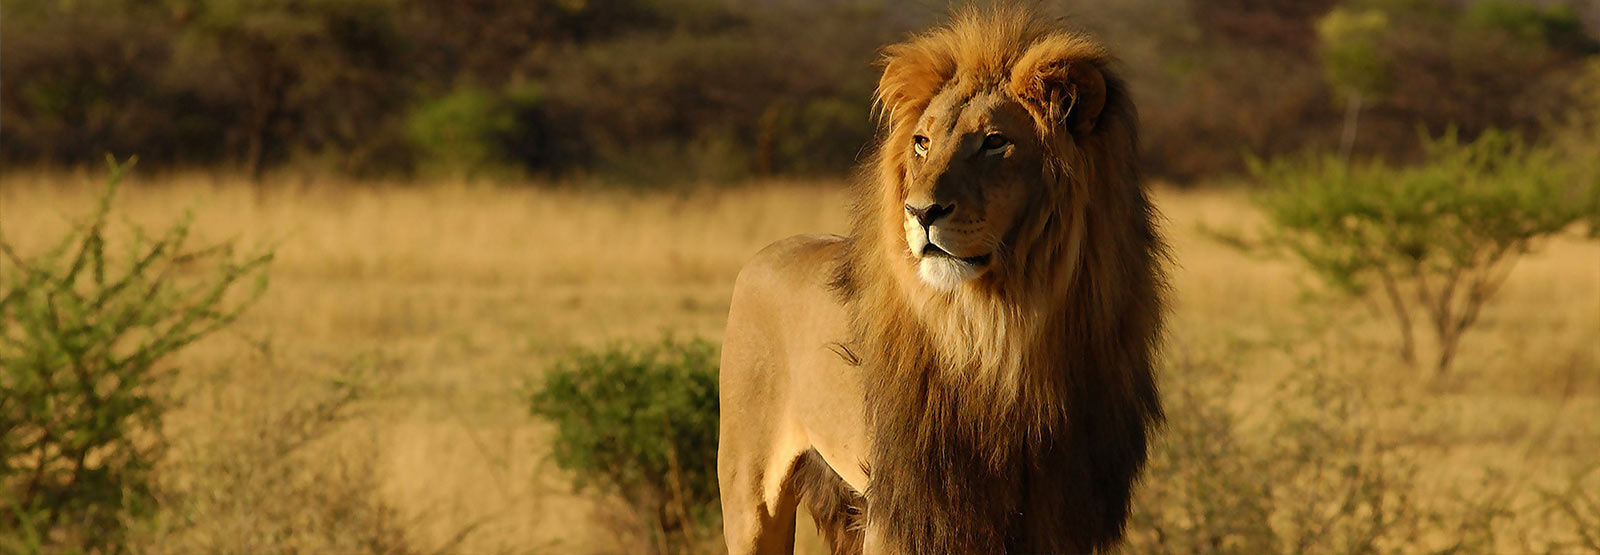 Mauritius Lion